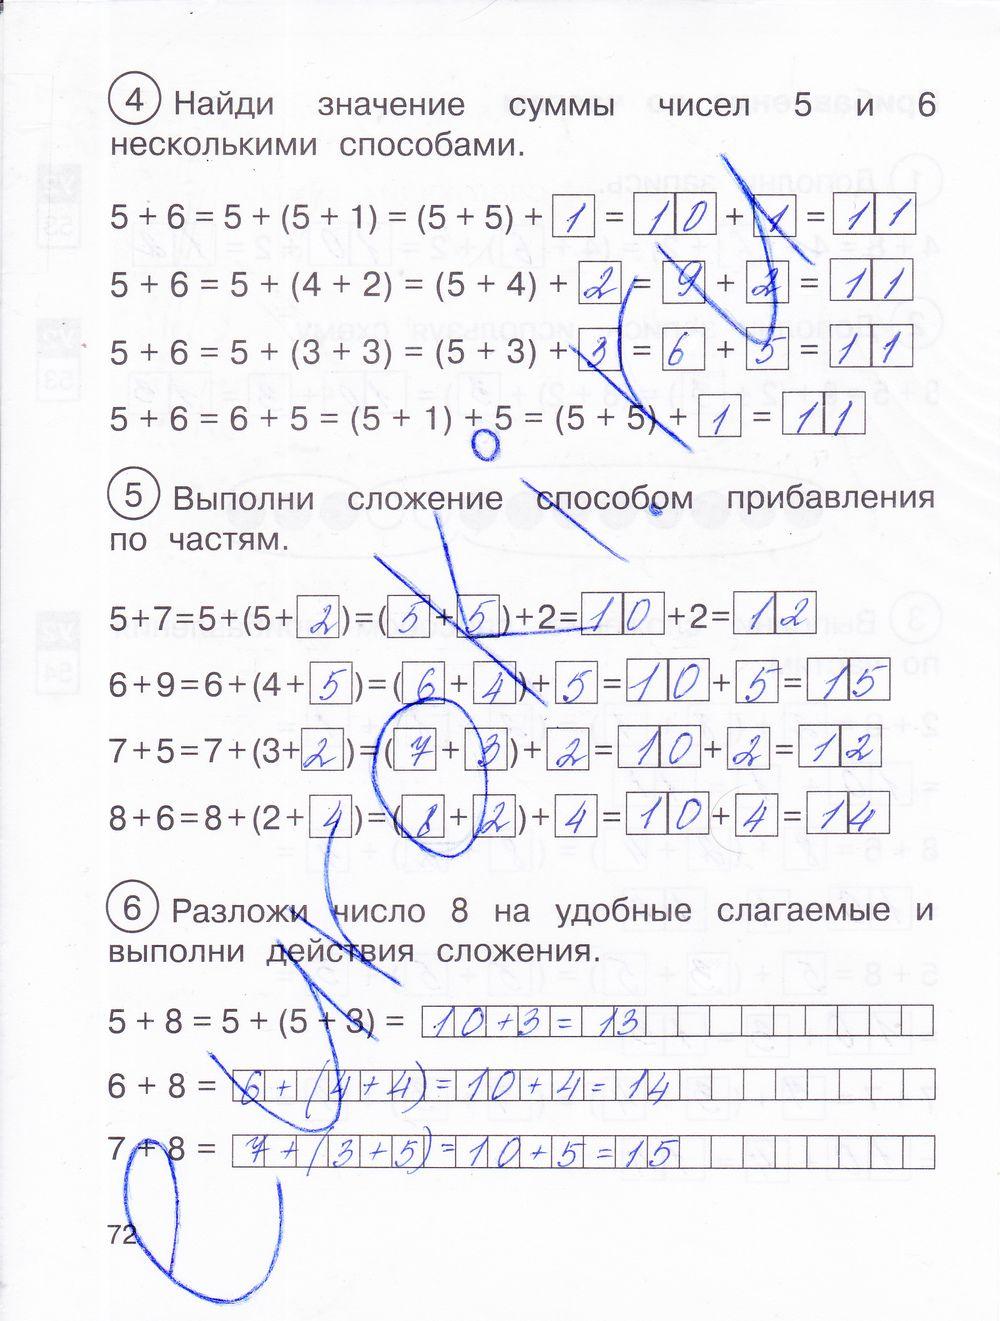 Алгебра 8 класс мордкович прфю уровень решение   saddsiva   pinterest.